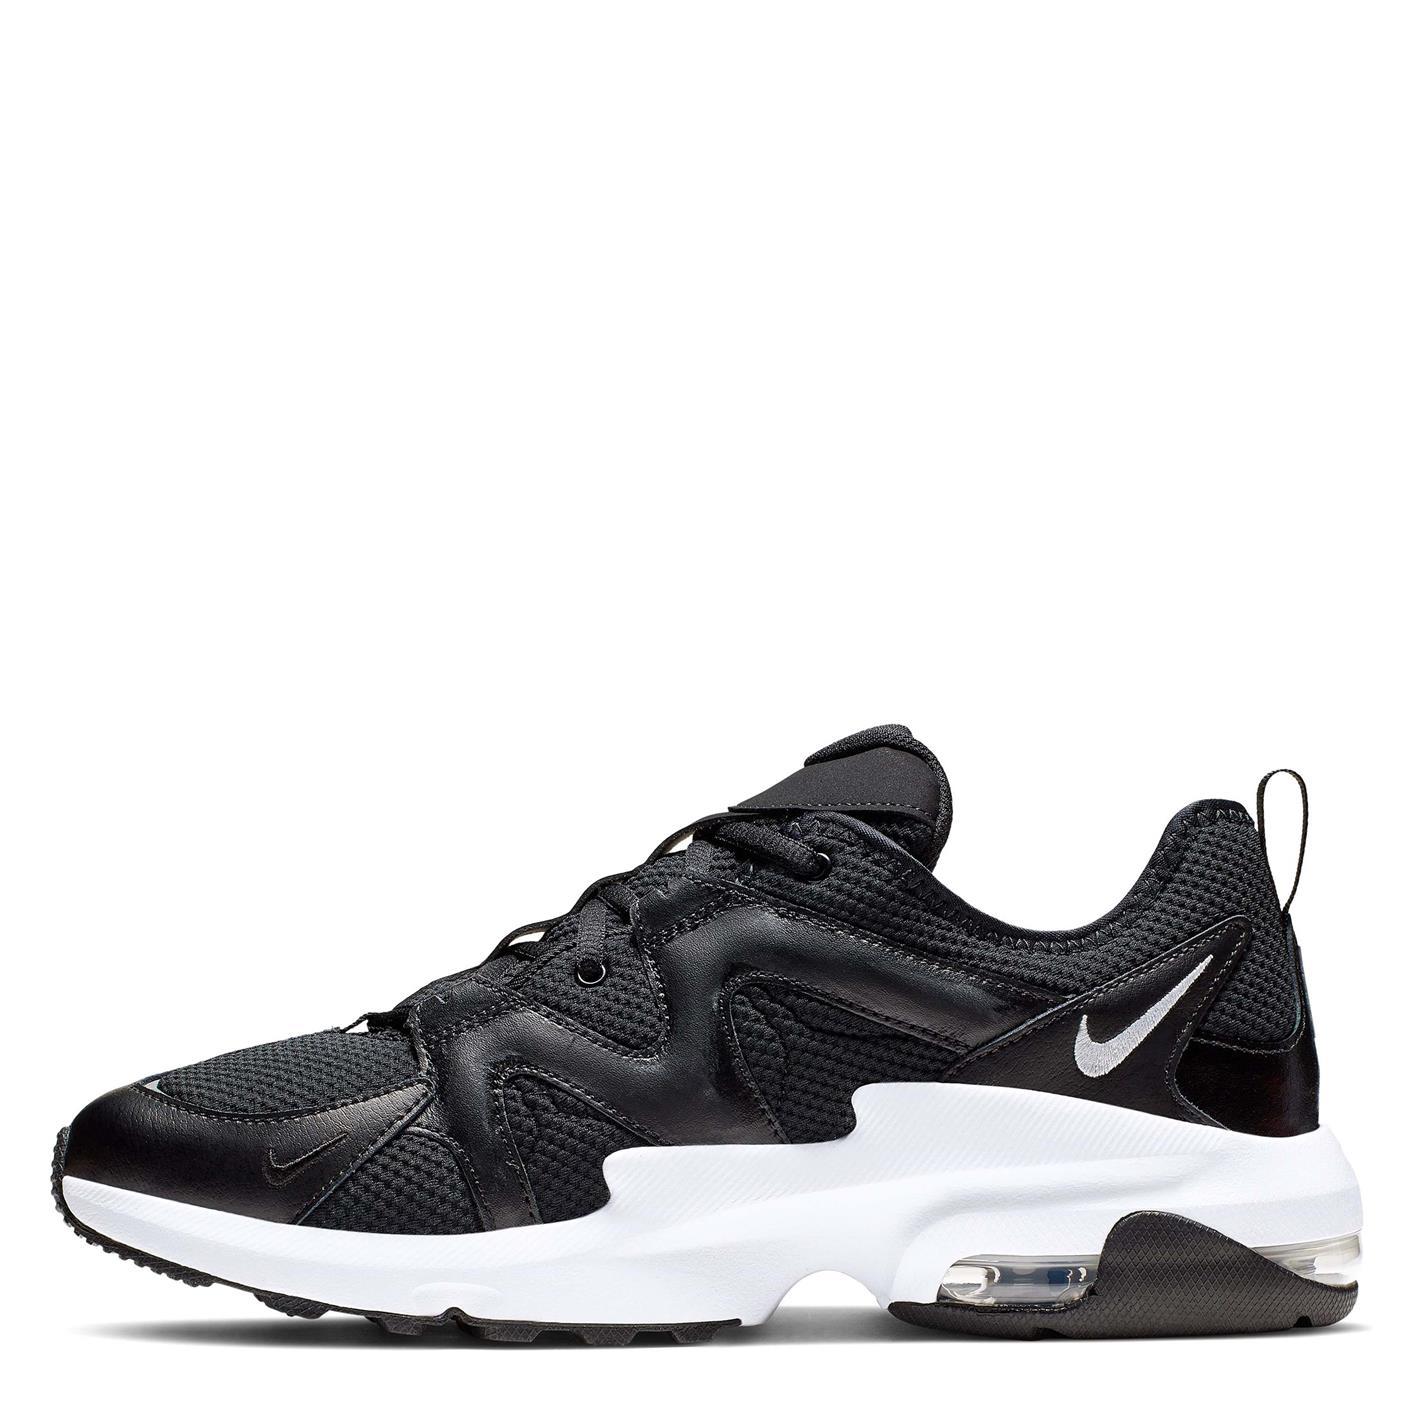 Nike Air Max Graviton Men's Shoe